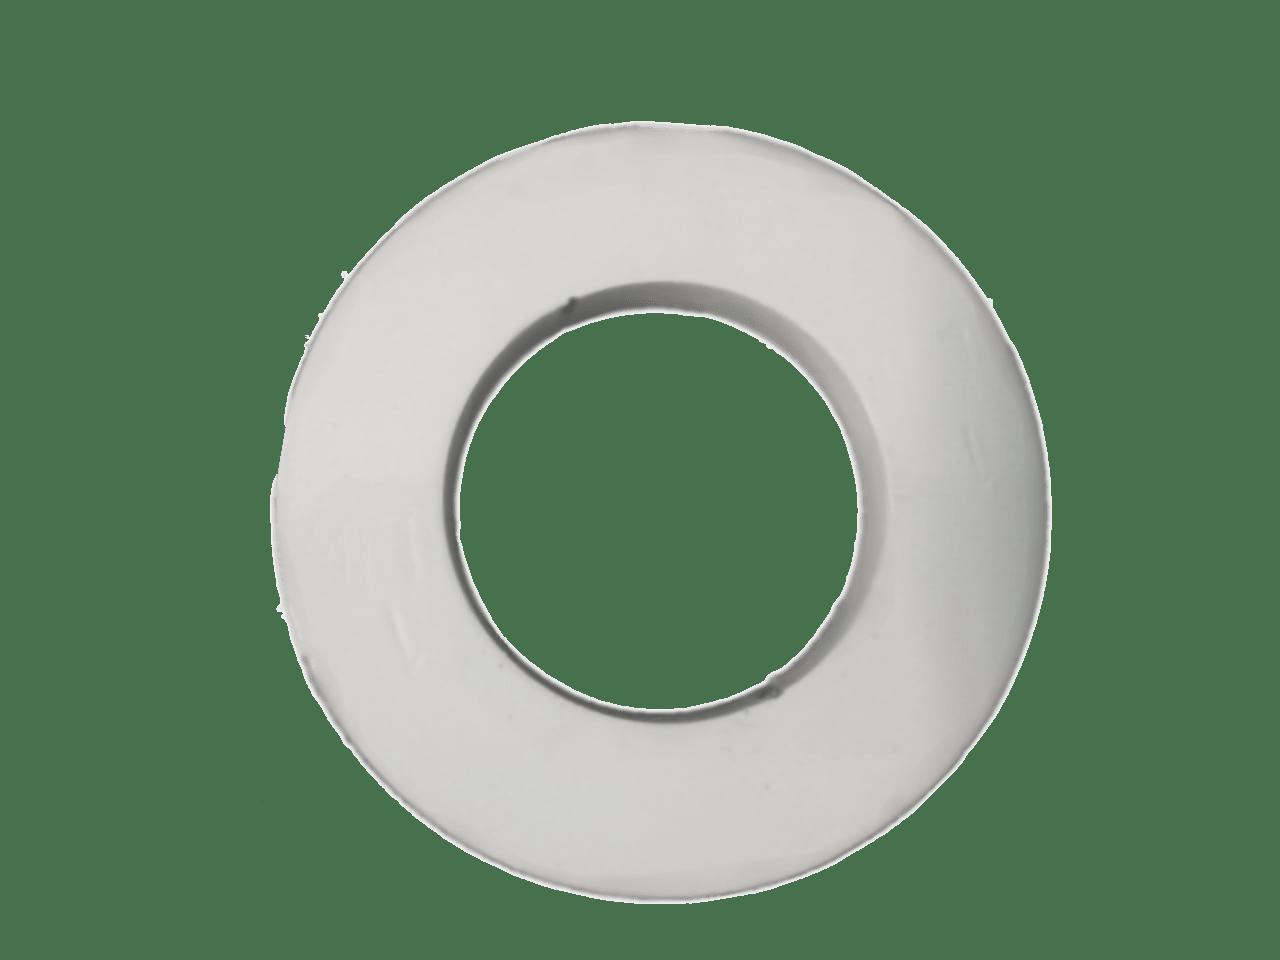 Anilha de ferro Fracionada Branca 1 Lbs